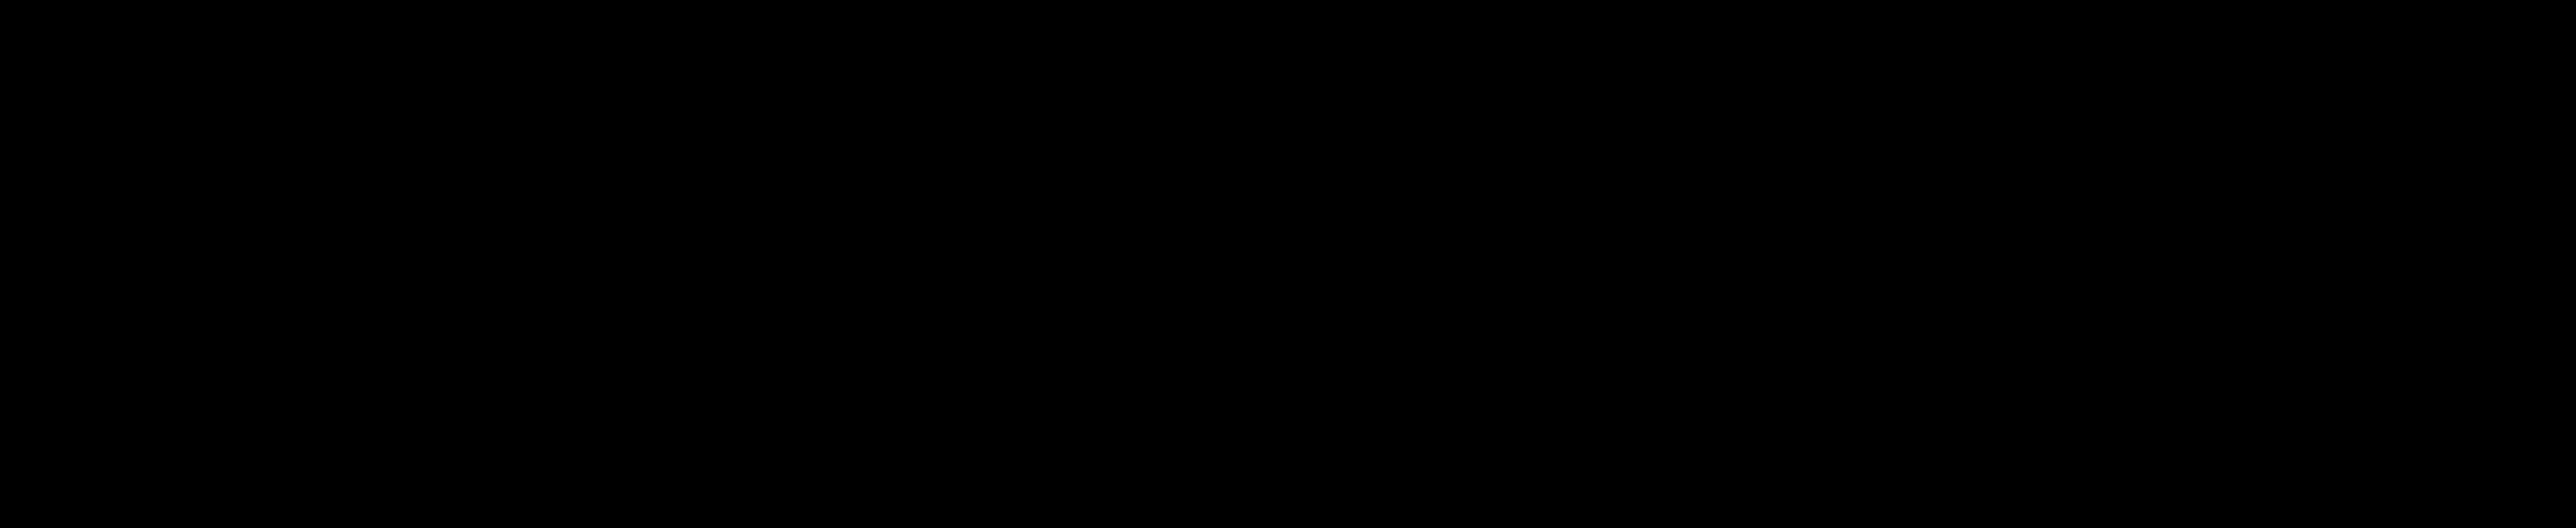 godaddy logo 8 - Godaddy Logo